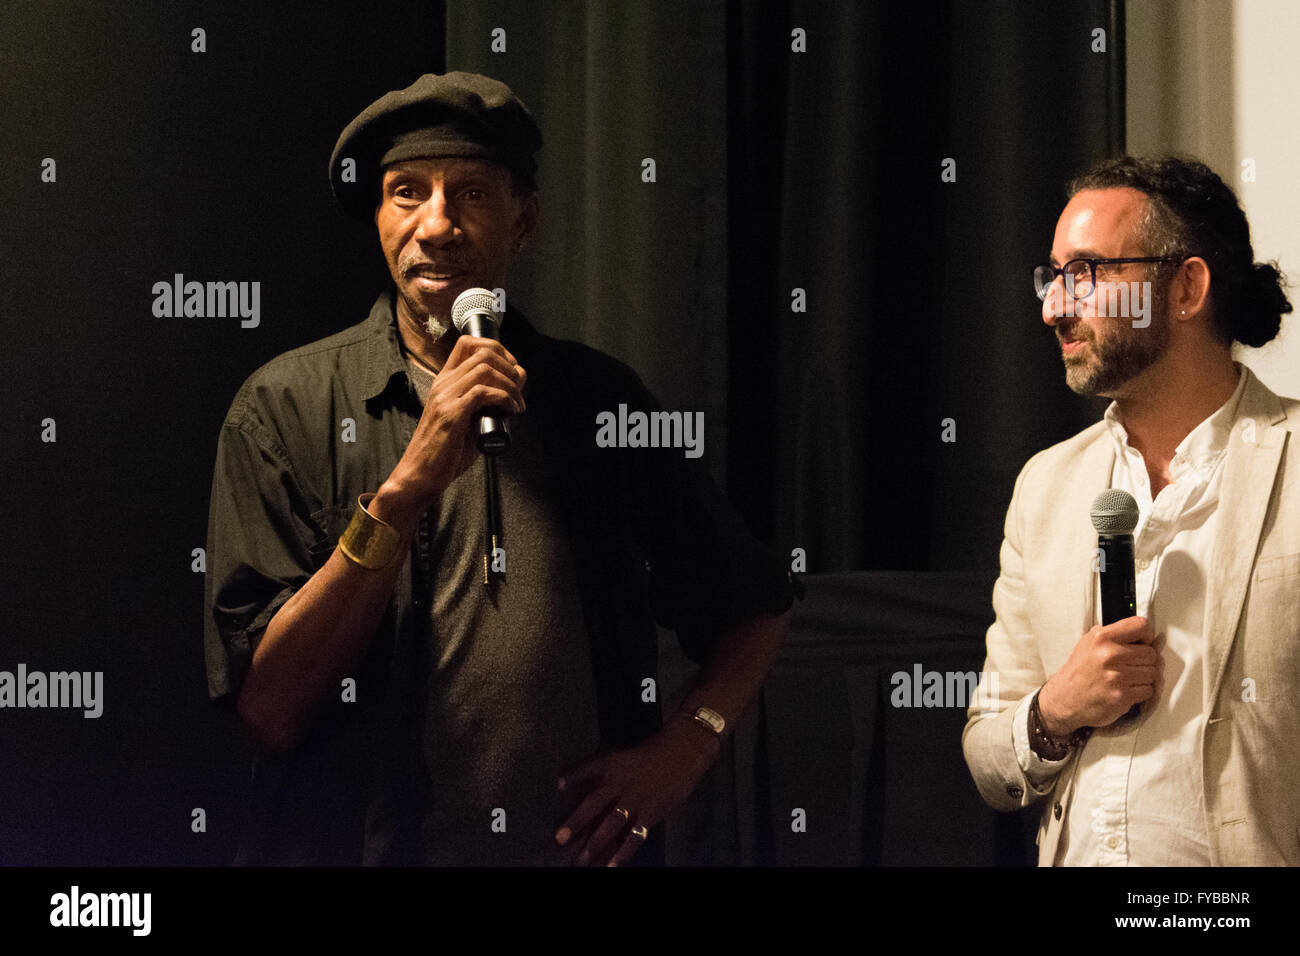 New York, USA. 23rd April 2016. Sam Waymon, brother and sideman of Ms. Simone, and Jeff L. Lieberman, the film's - Stock Image